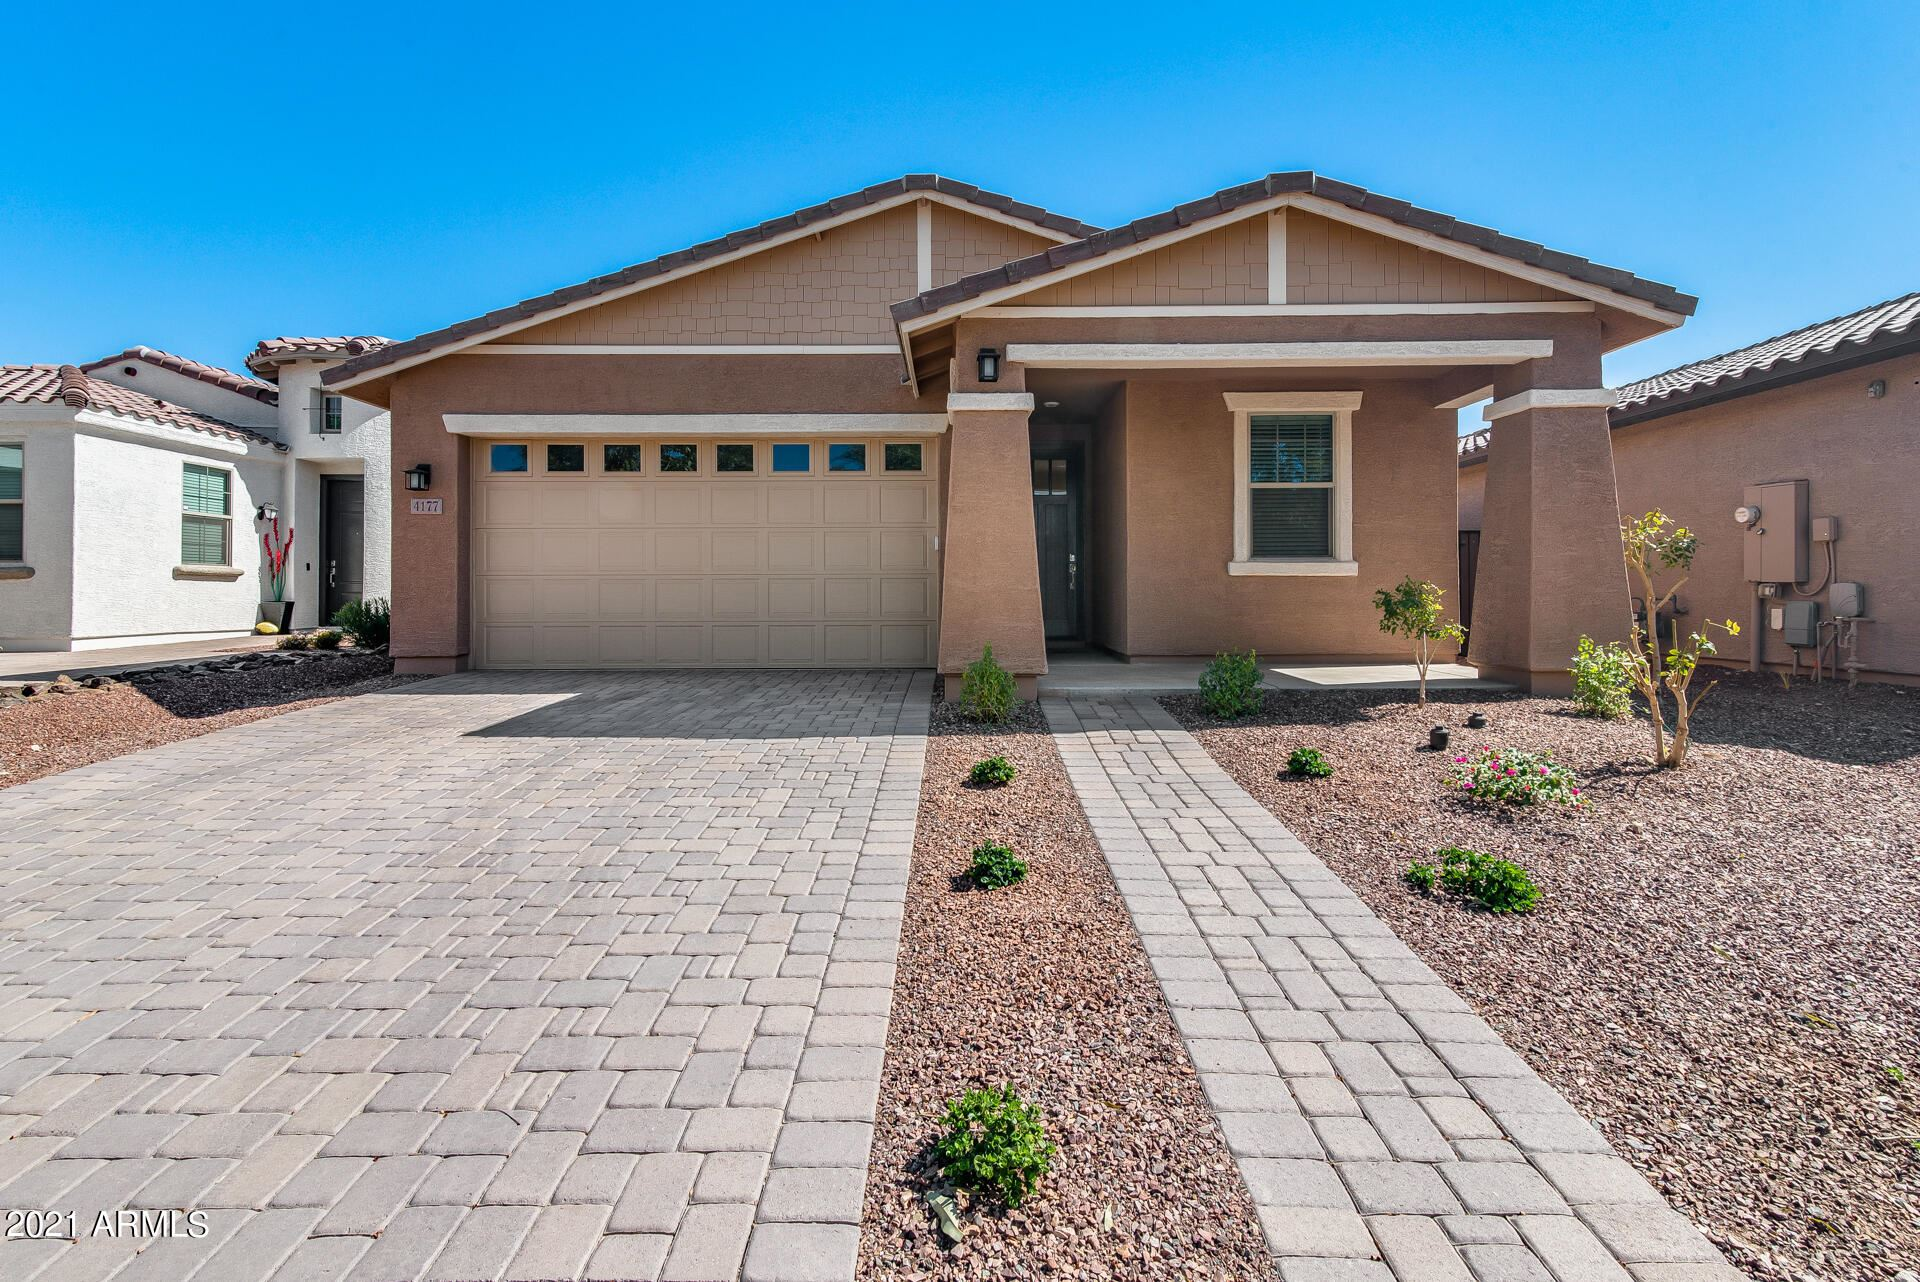 Photo of 4177 N 198TH Avenue, Litchfield Park, AZ 85340 (MLS # 6310198)